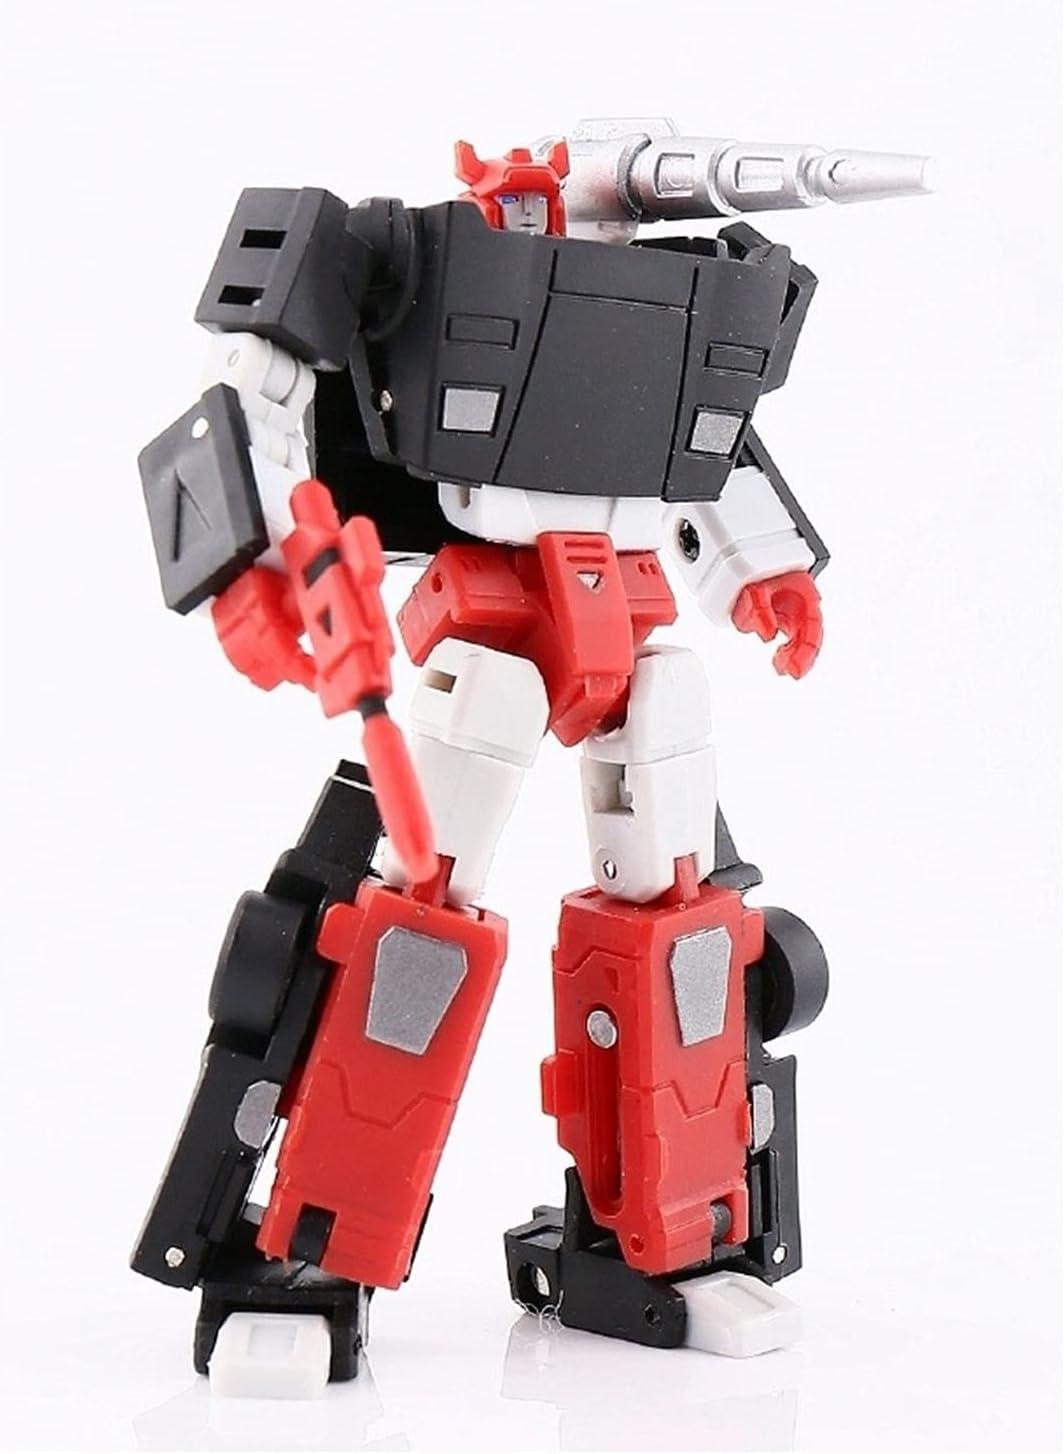 WJYLM Robot Transformer KO Transformers Tampa Mall Toy Horiz MS-B07B Max 70% OFF Black